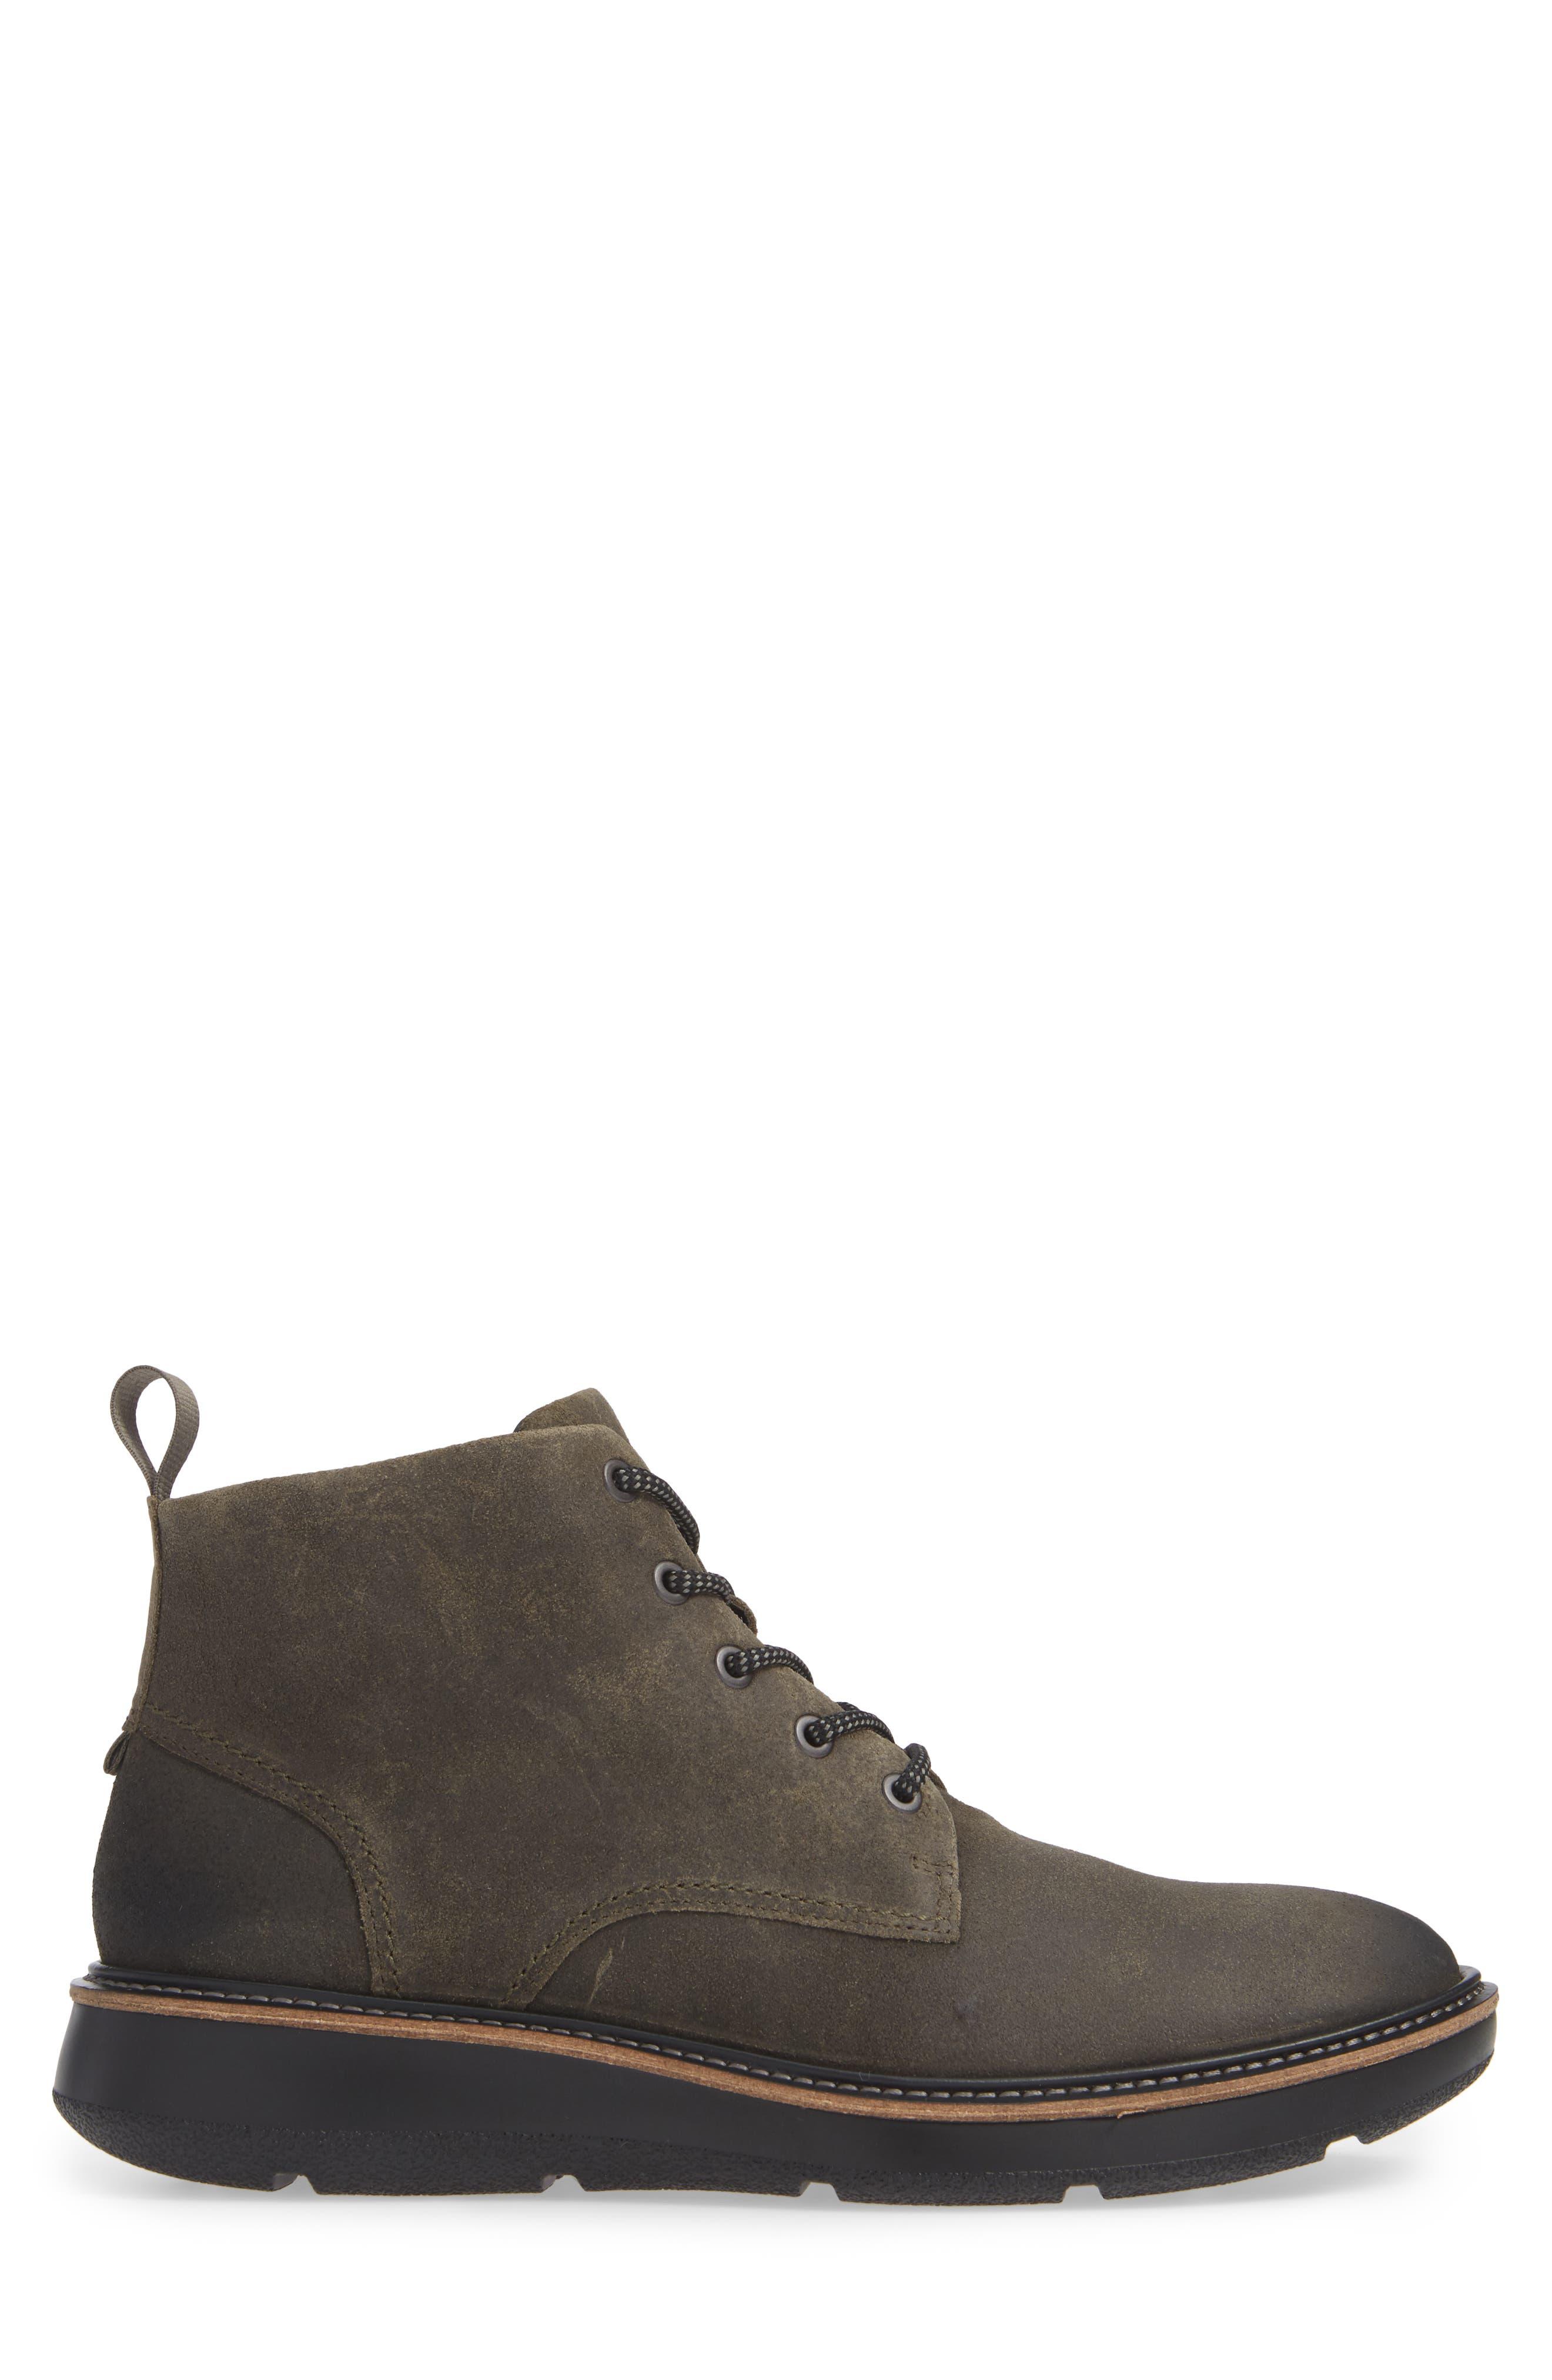 Aurora Plain Toe Boot,                             Alternate thumbnail 3, color,                             TARMAC SUEDE